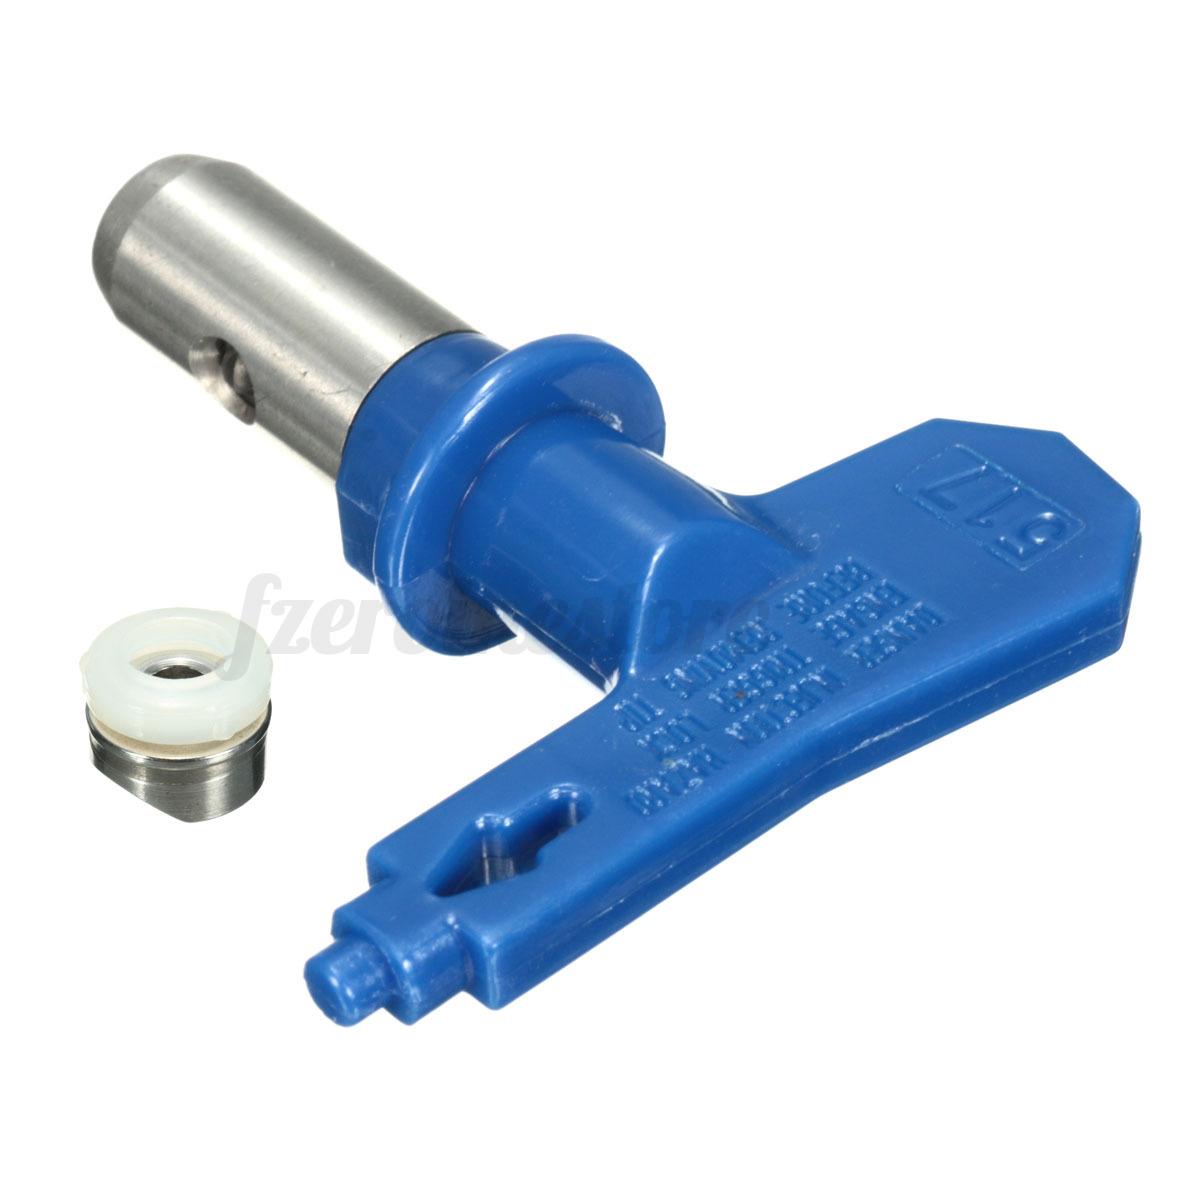 size 517 airless spray tip for graco titan wagner gun paint sprayer. Black Bedroom Furniture Sets. Home Design Ideas